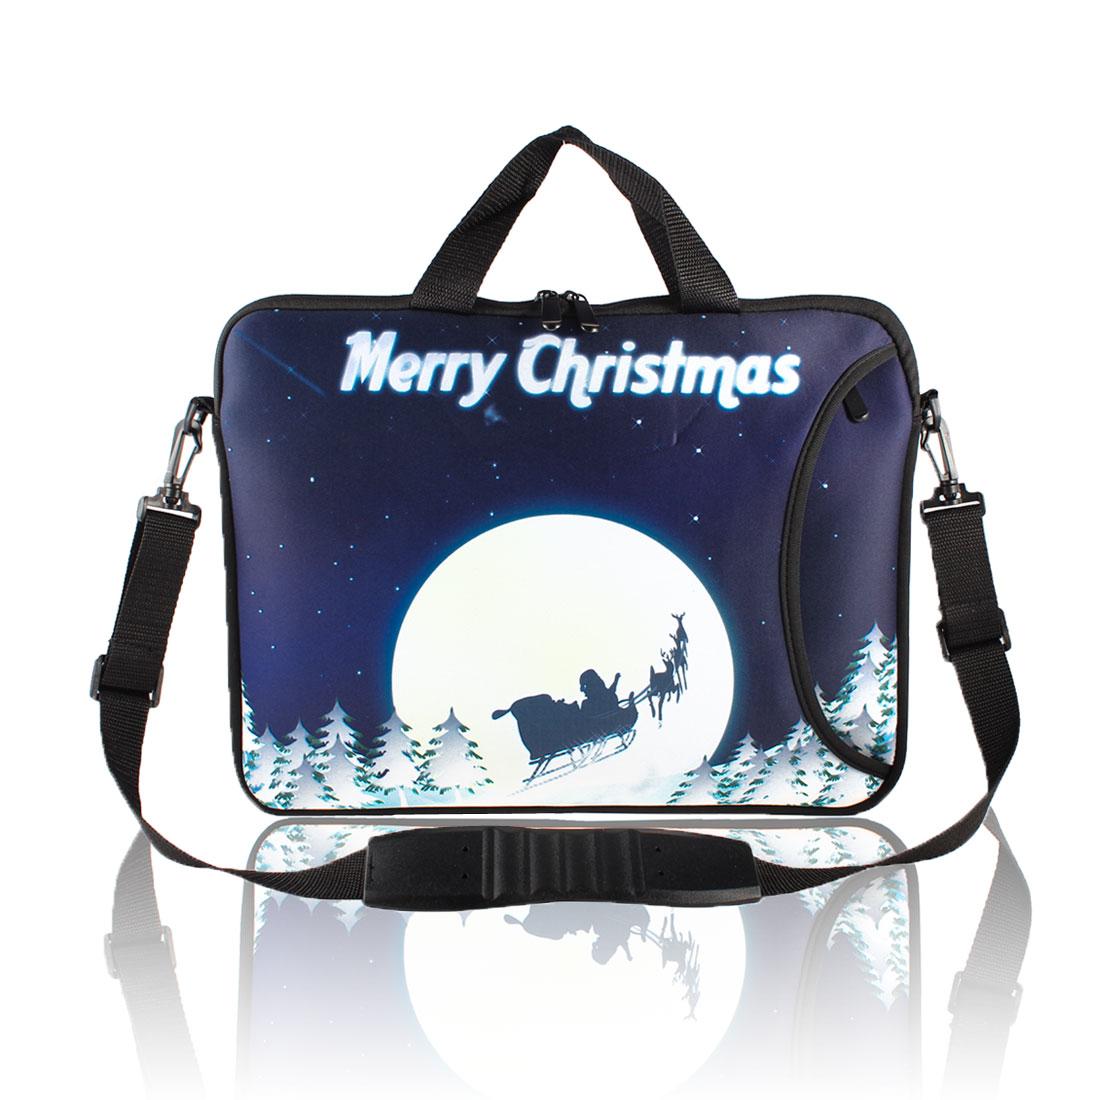 transporte-de-hombro-bolsa-de-funda-de-cubierta-de-manga-para-15-034-15-6-034-Laptop